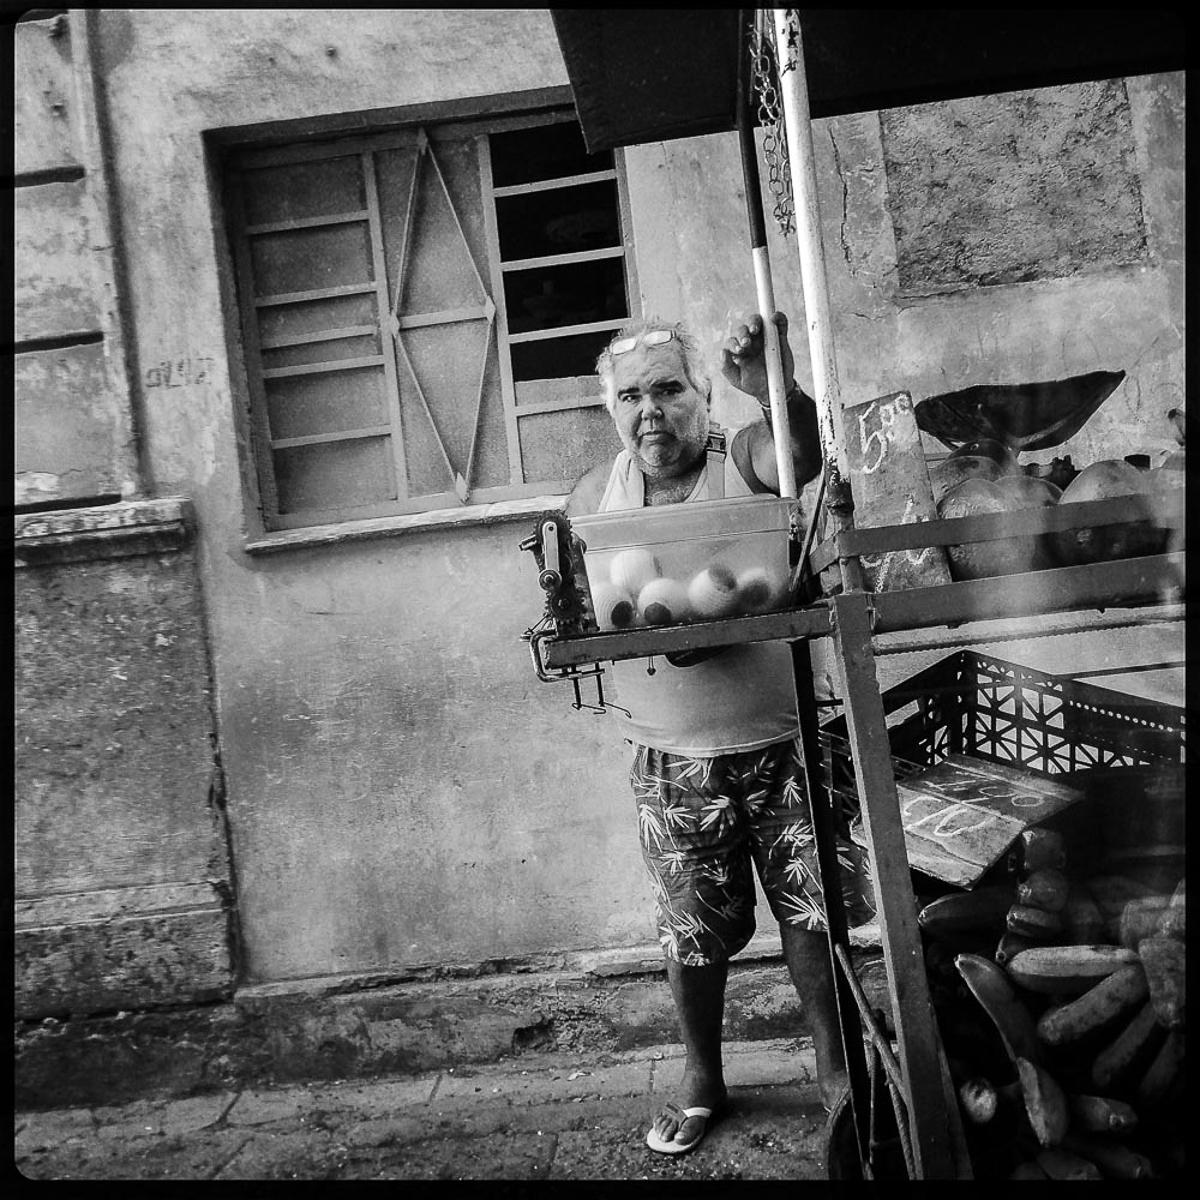 Street vendor, Havana Cuba 2014